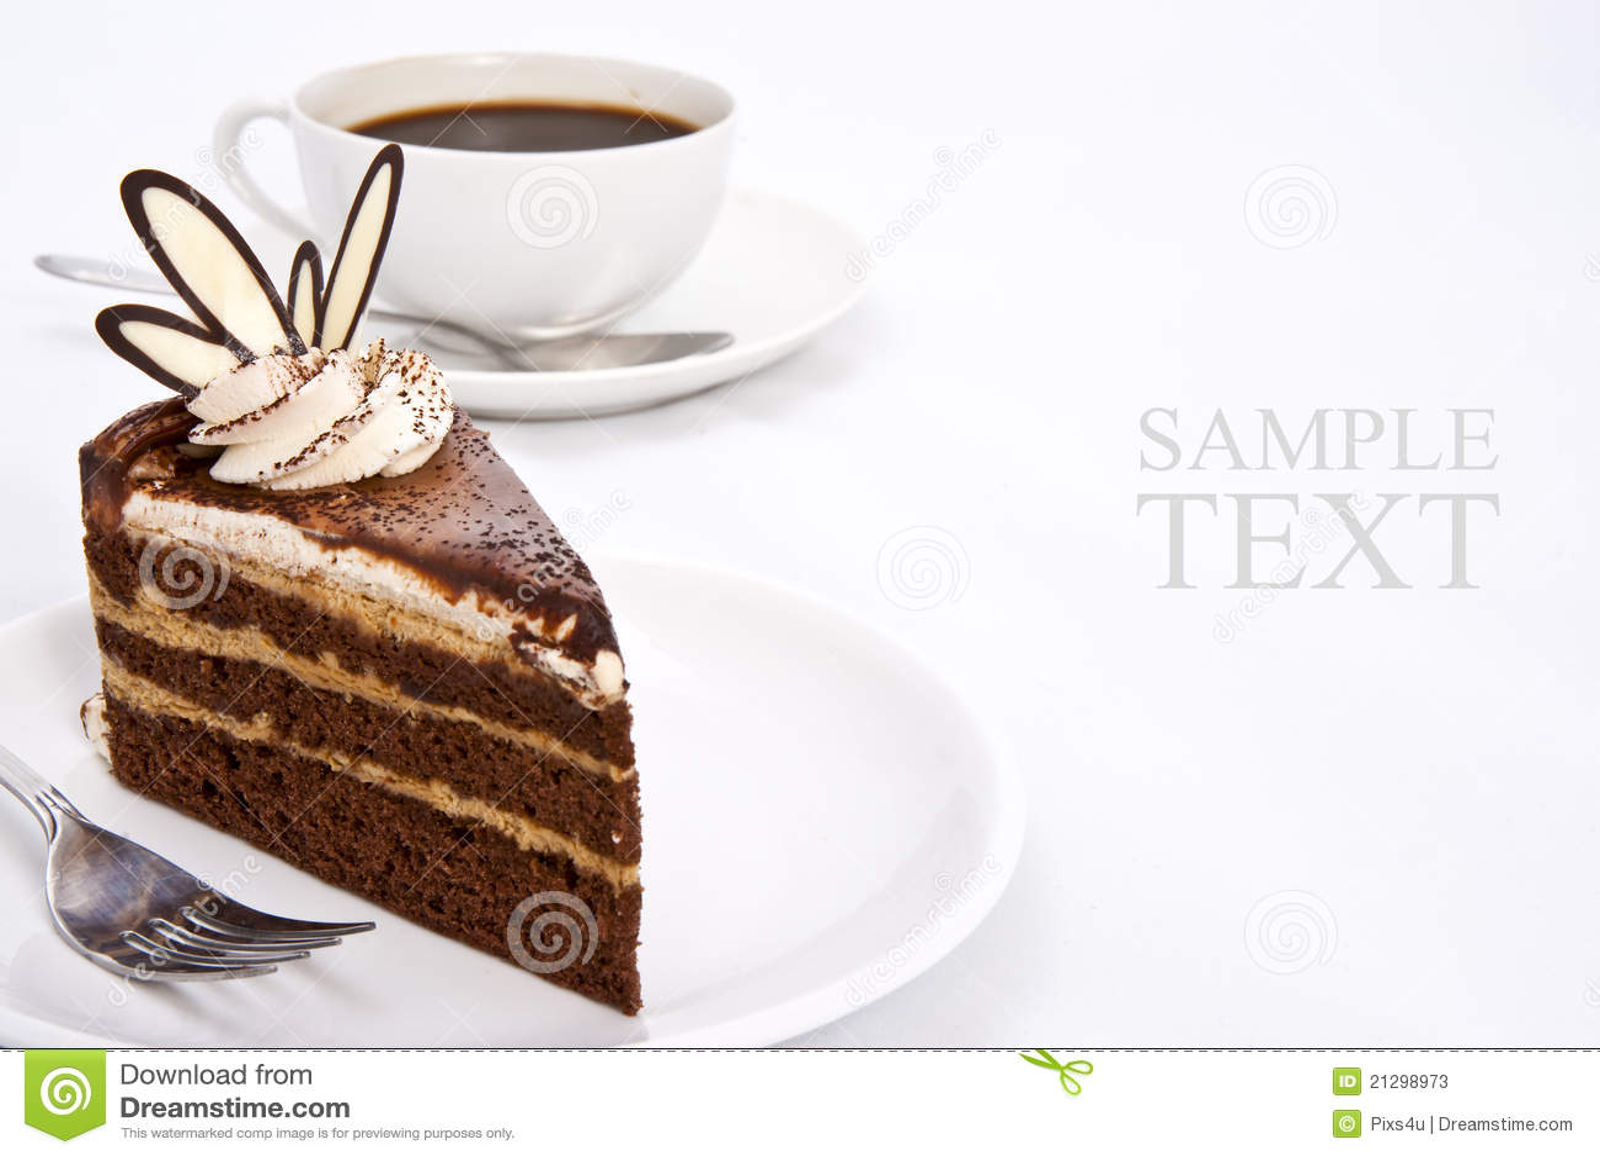 Three Layers Chocolate Cake and espresso Coffee